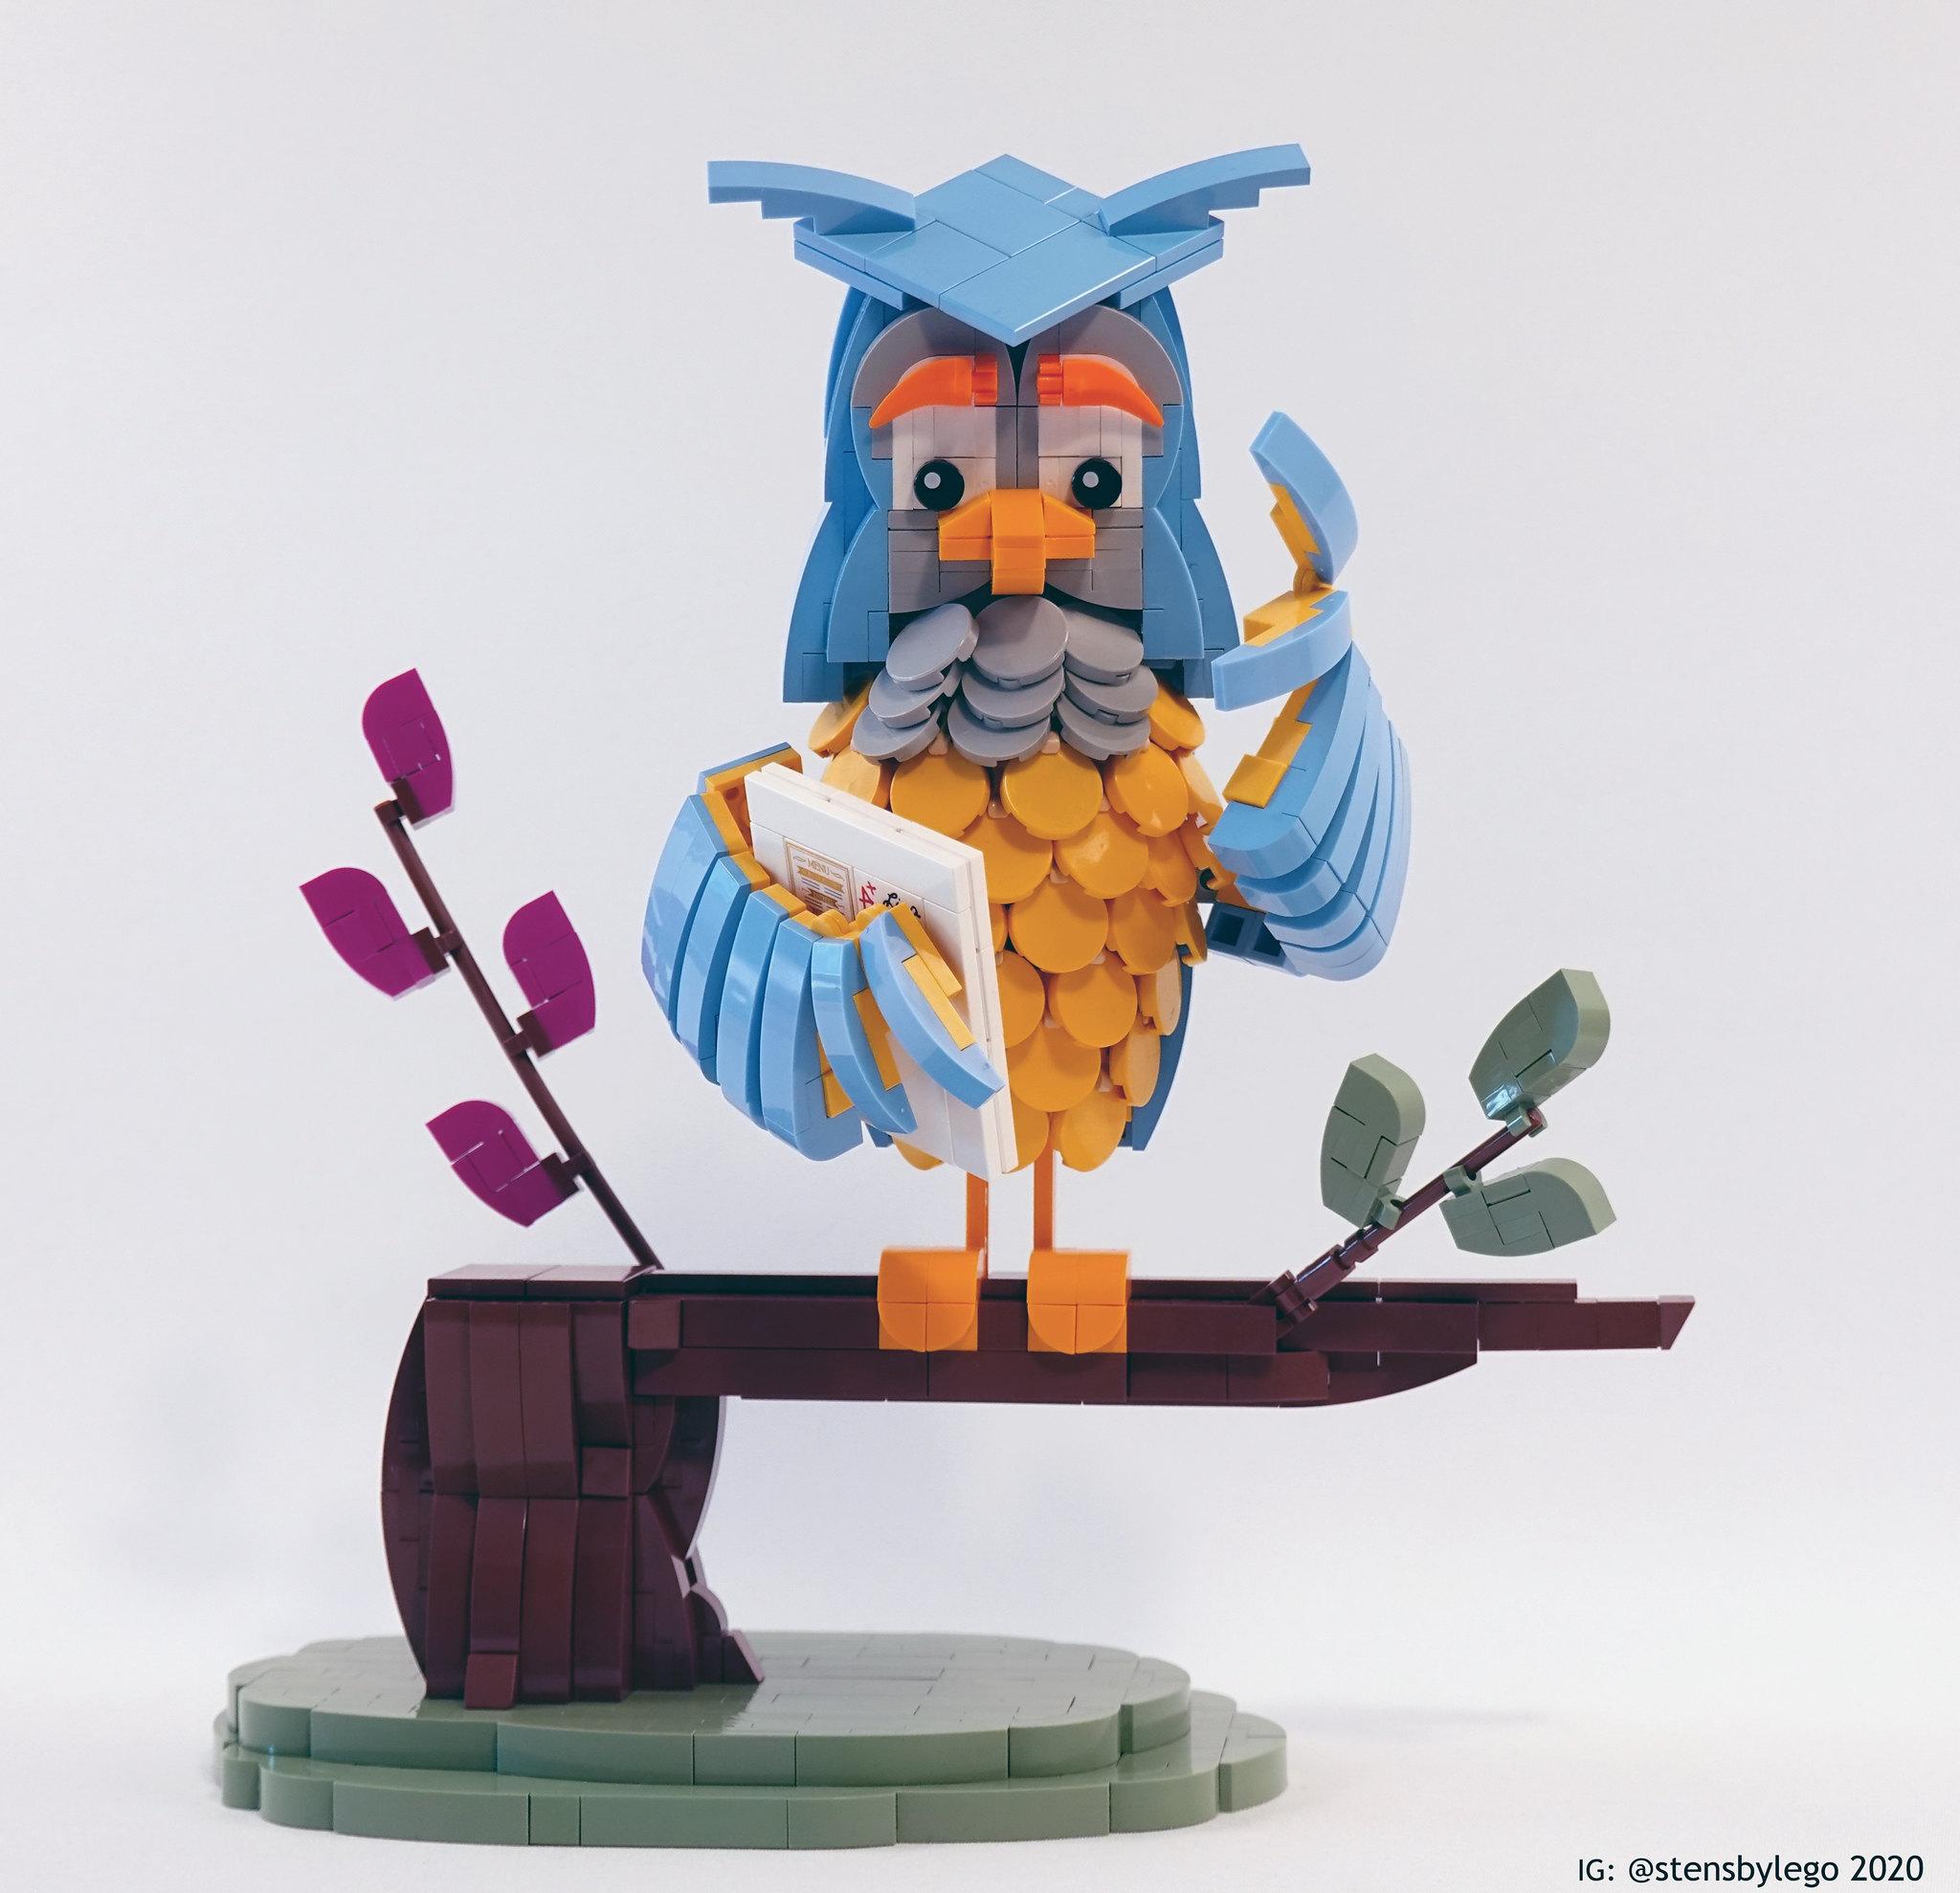 [MOC] LEGO Meneer de uil